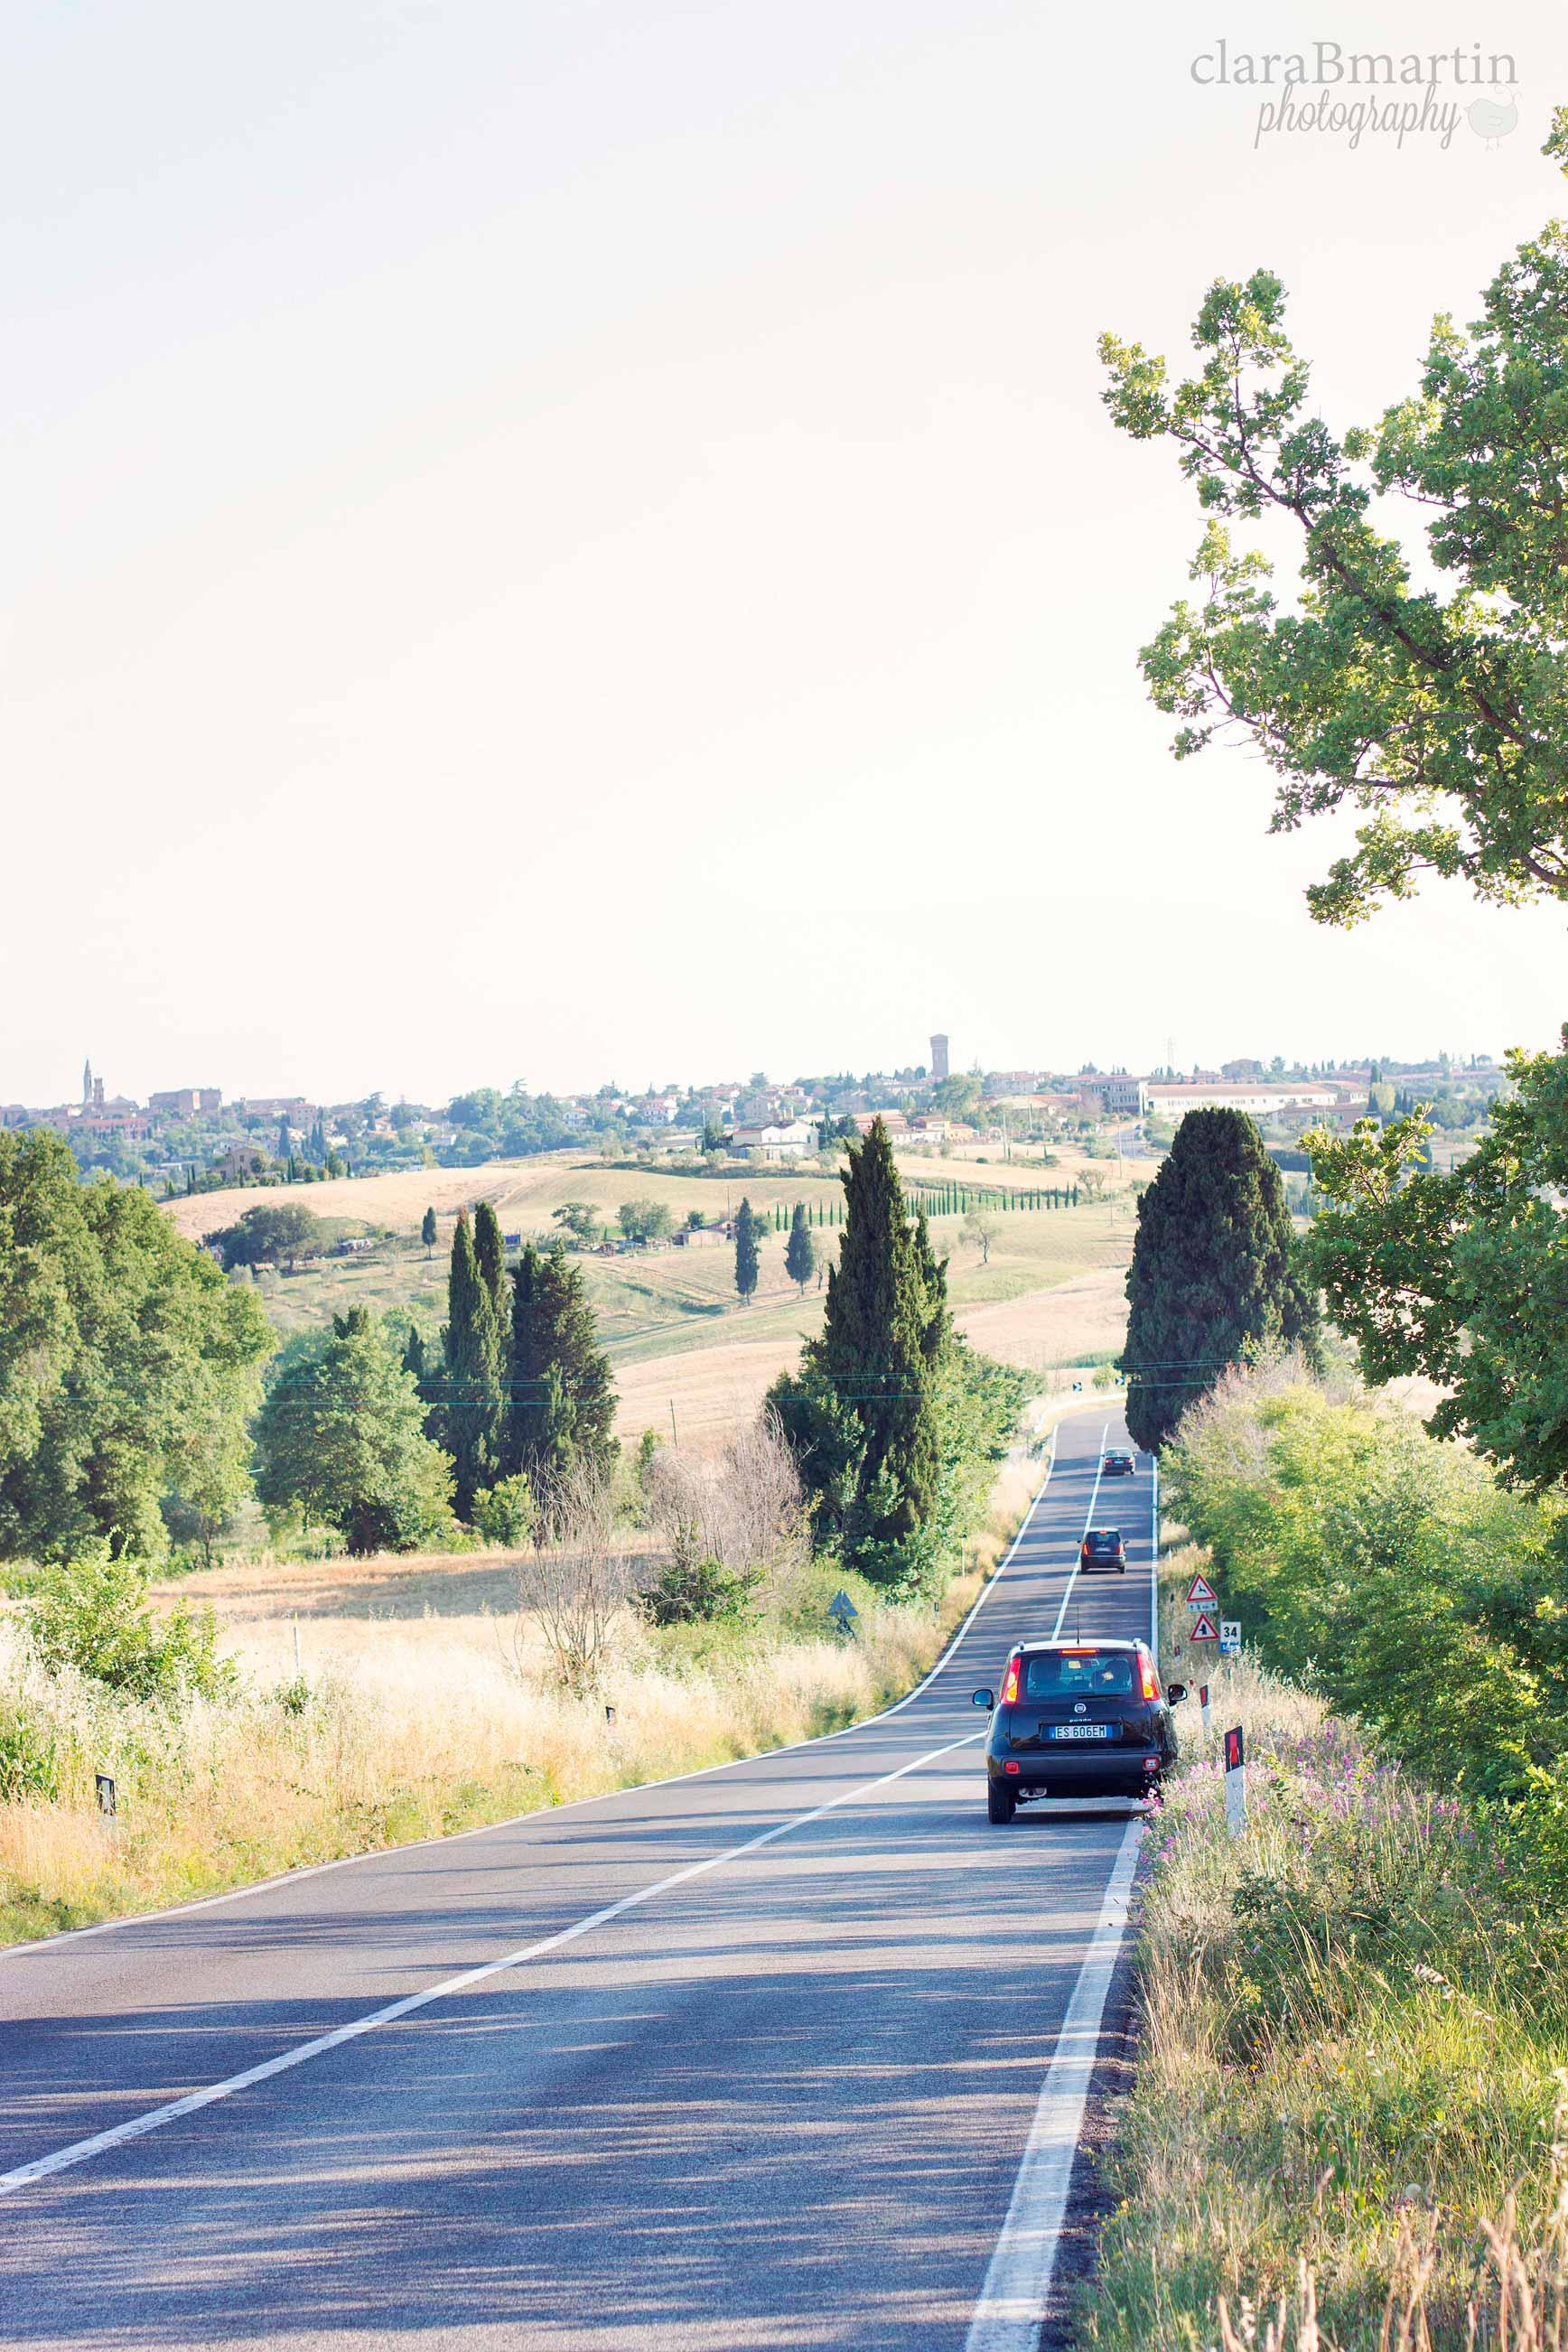 Toscana_claraBmartin04